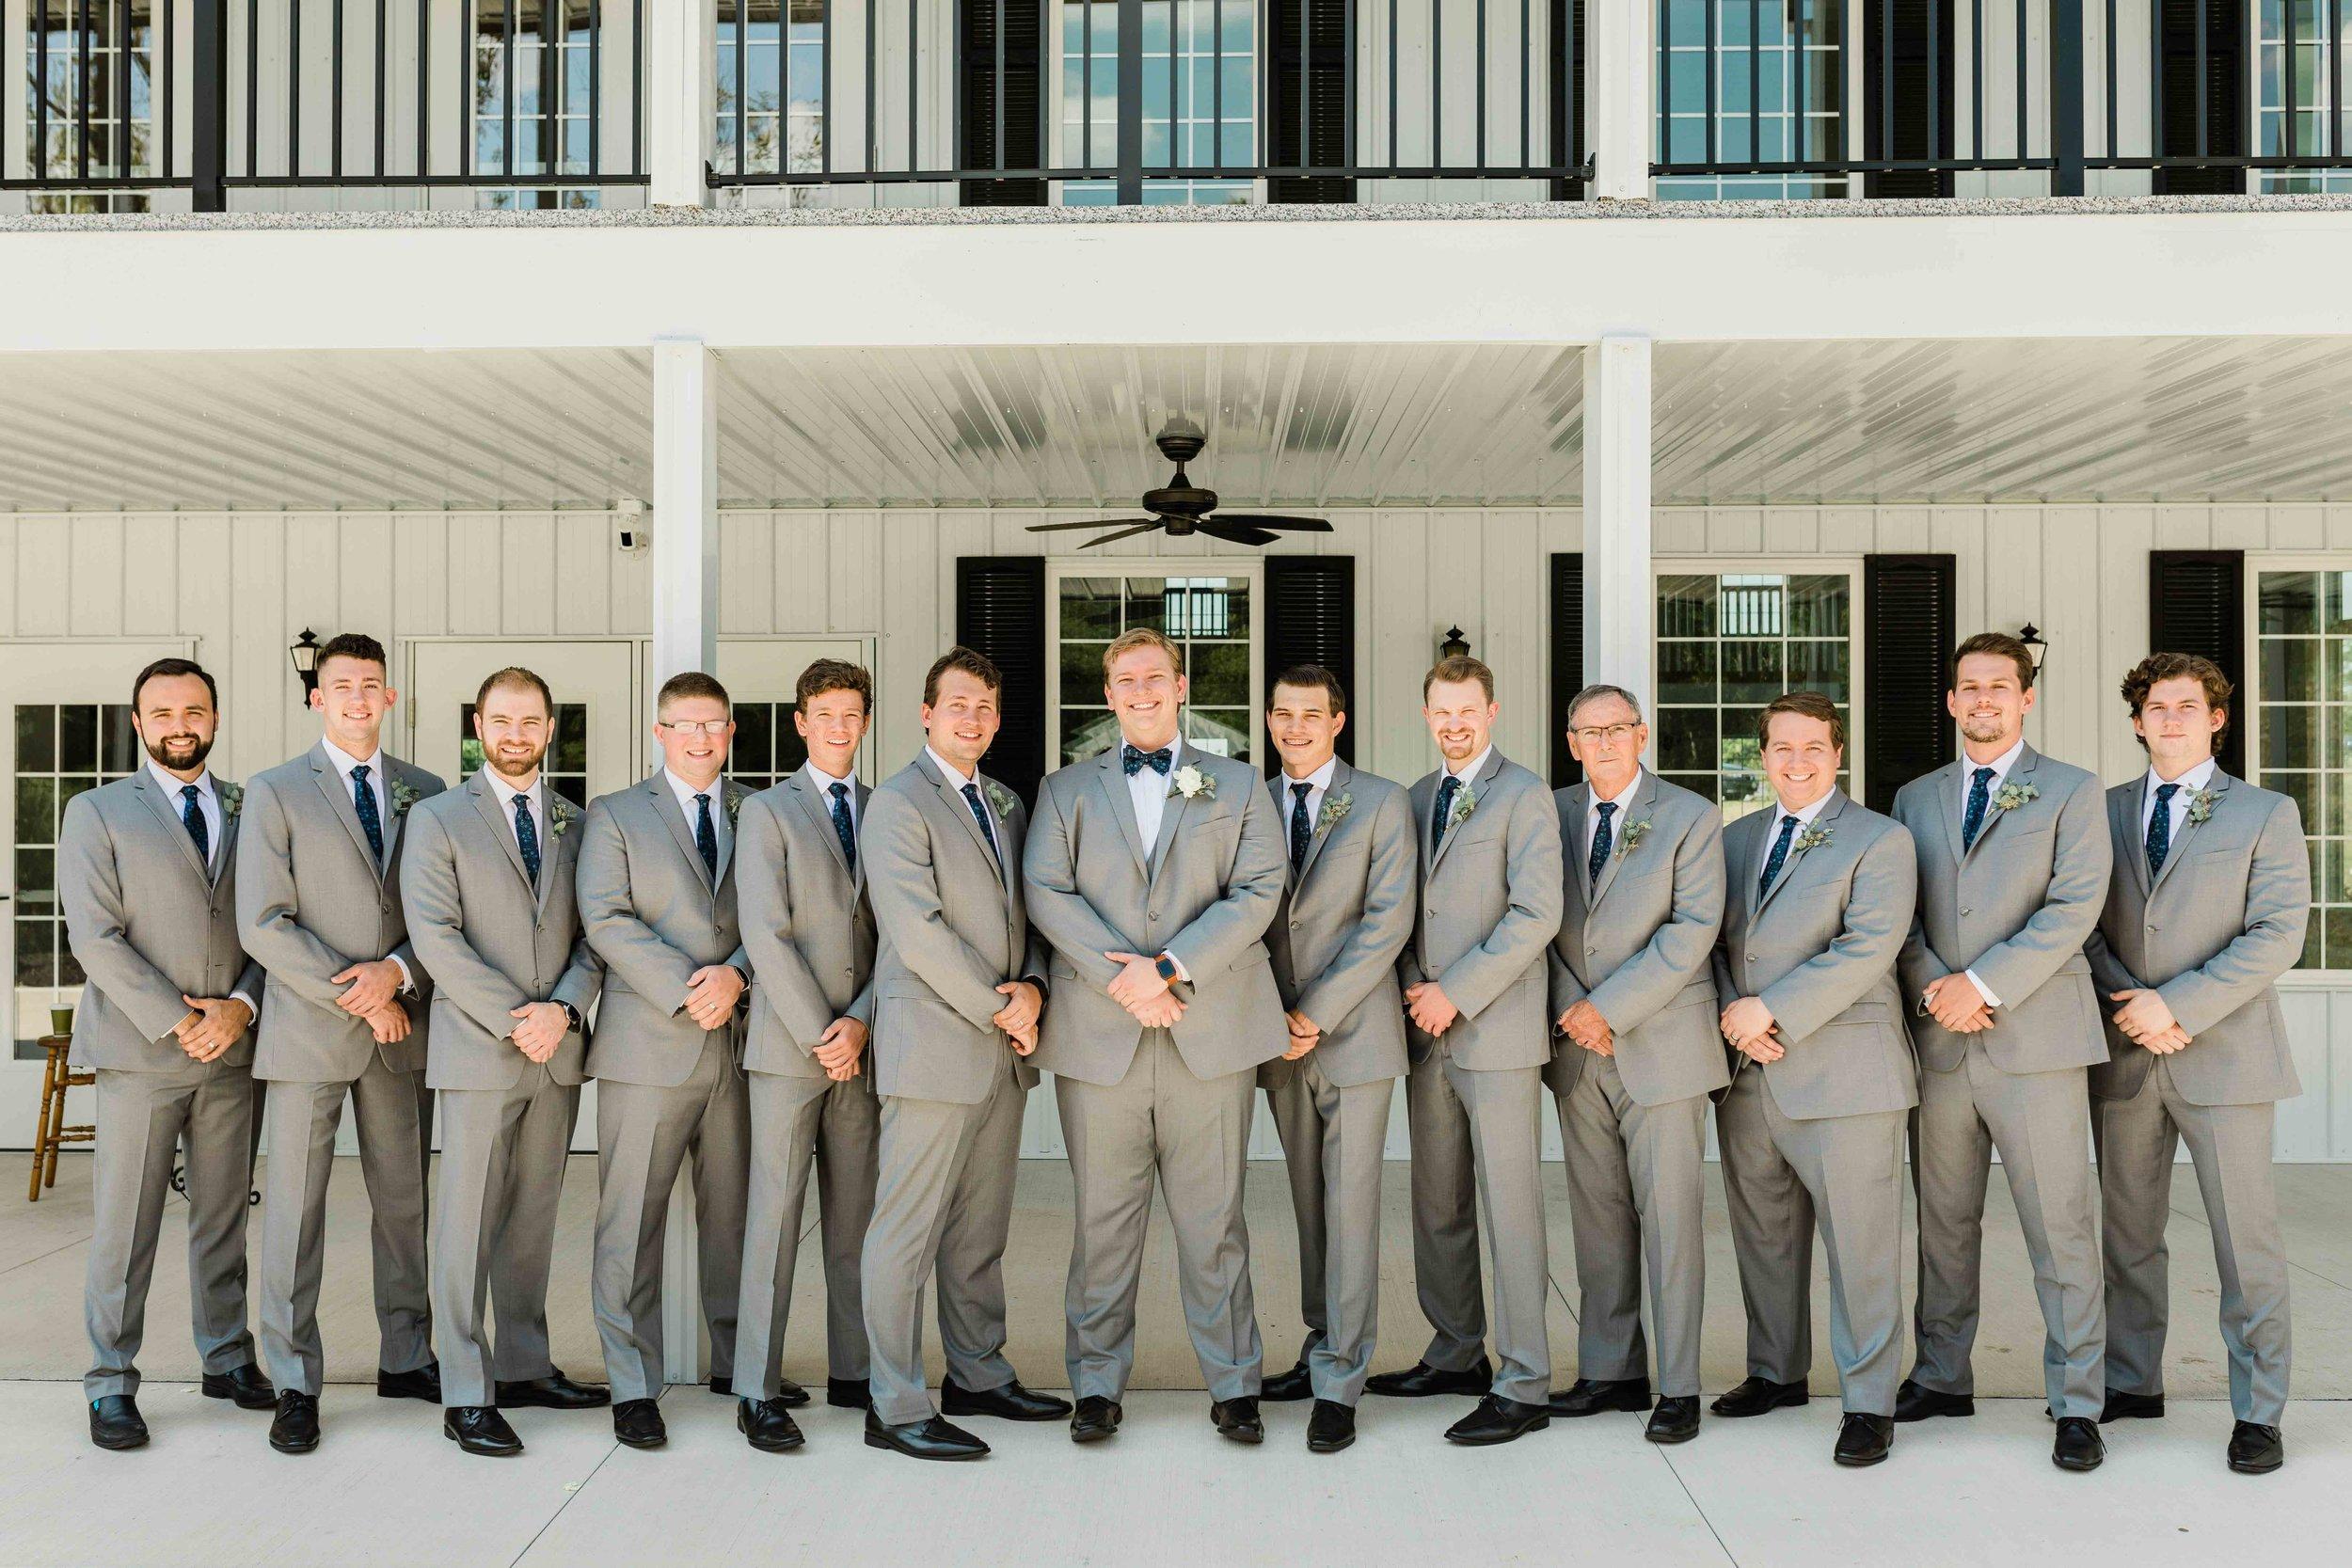 rosewood manor miamisburg ohio wedding-8.jpg